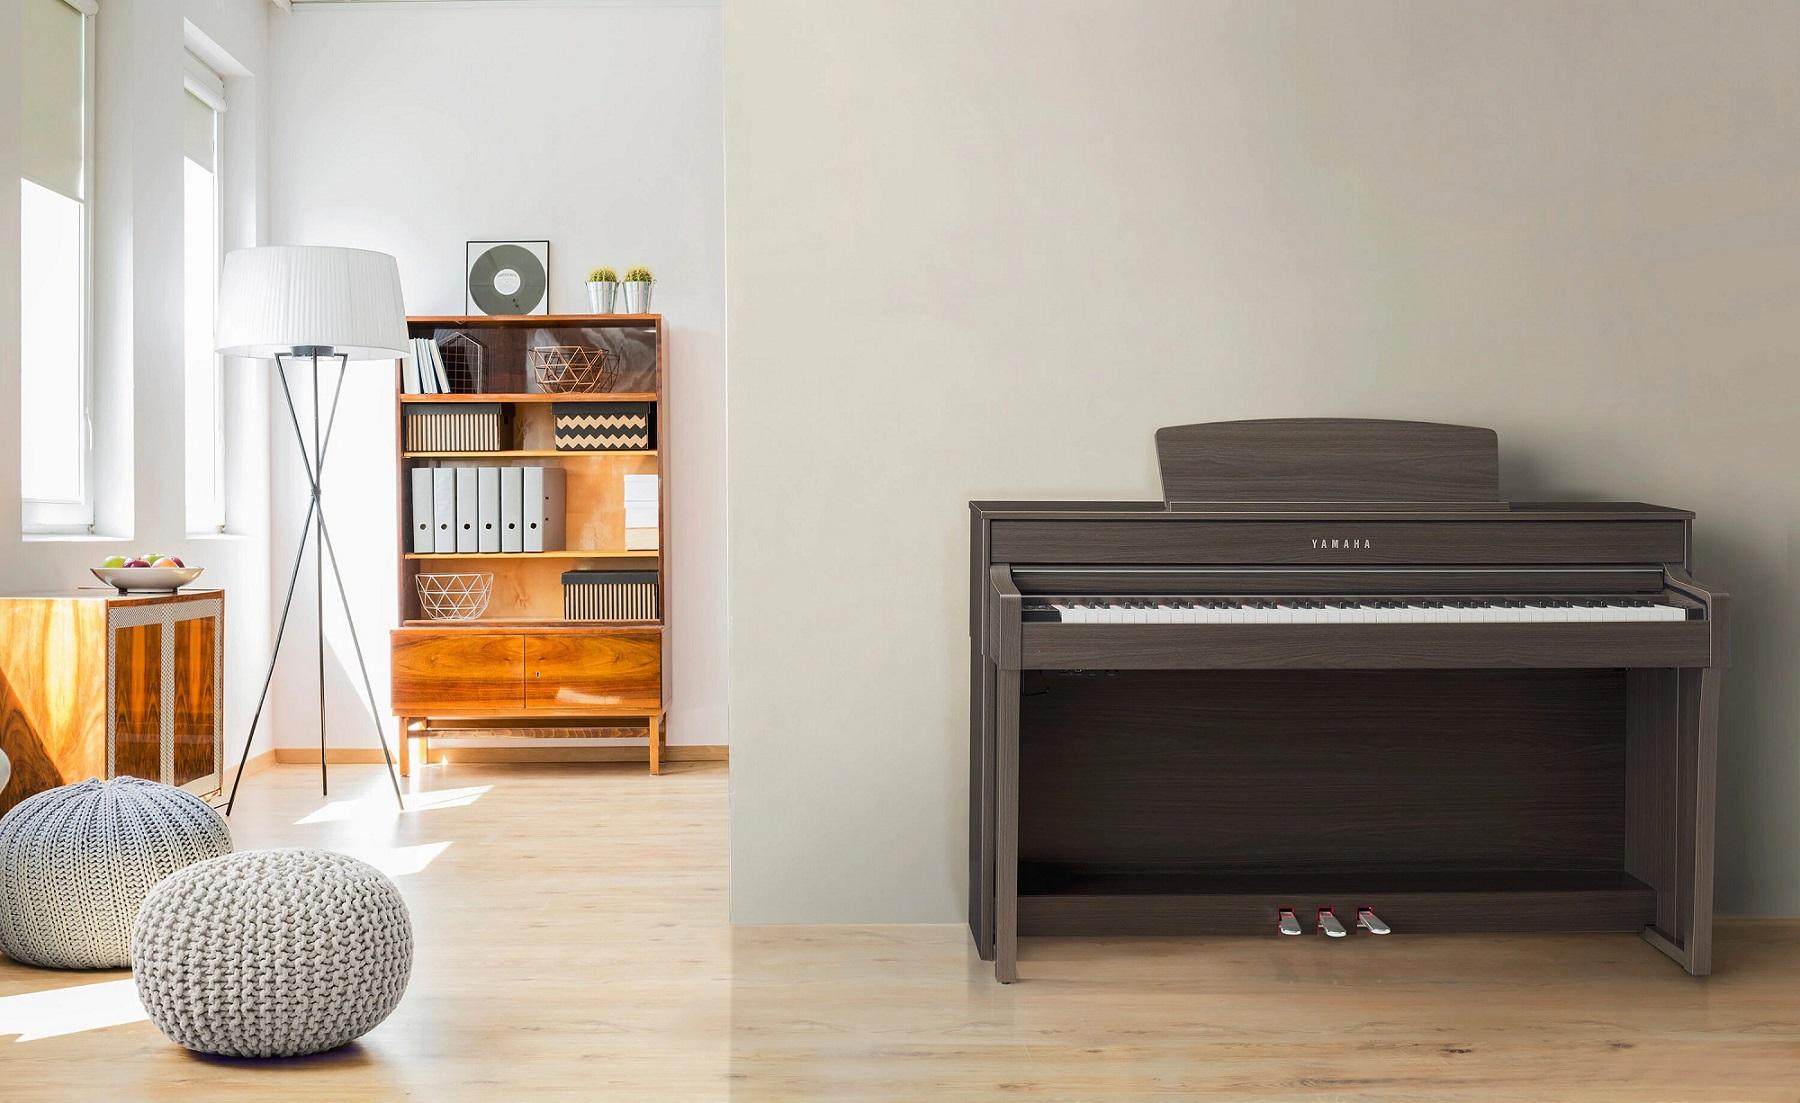 پیانوی دیجیتال Yamaha CLP-625